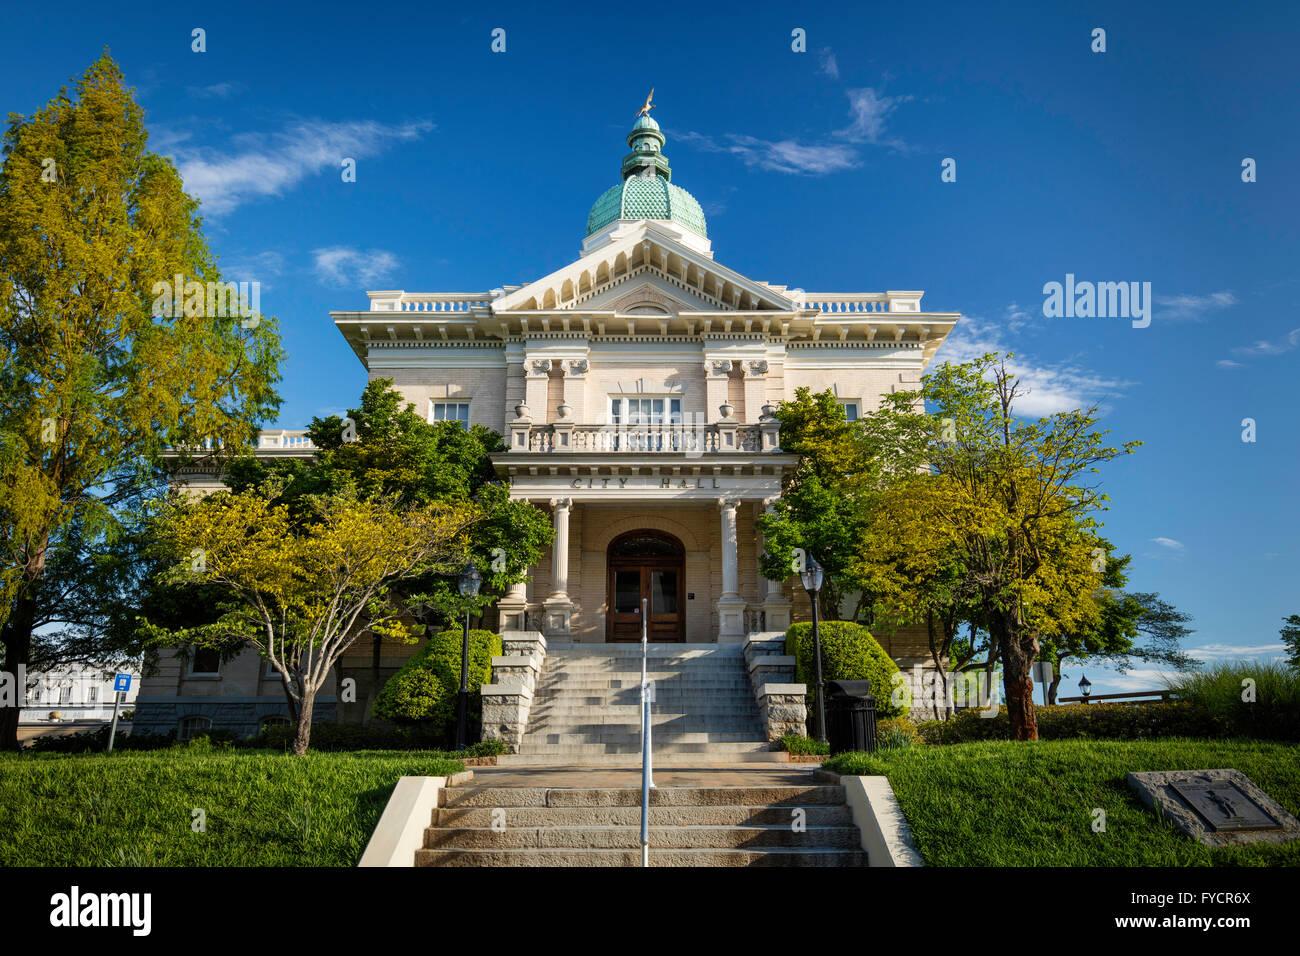 City Hall, Athens, Georgia, USA - Stock Image